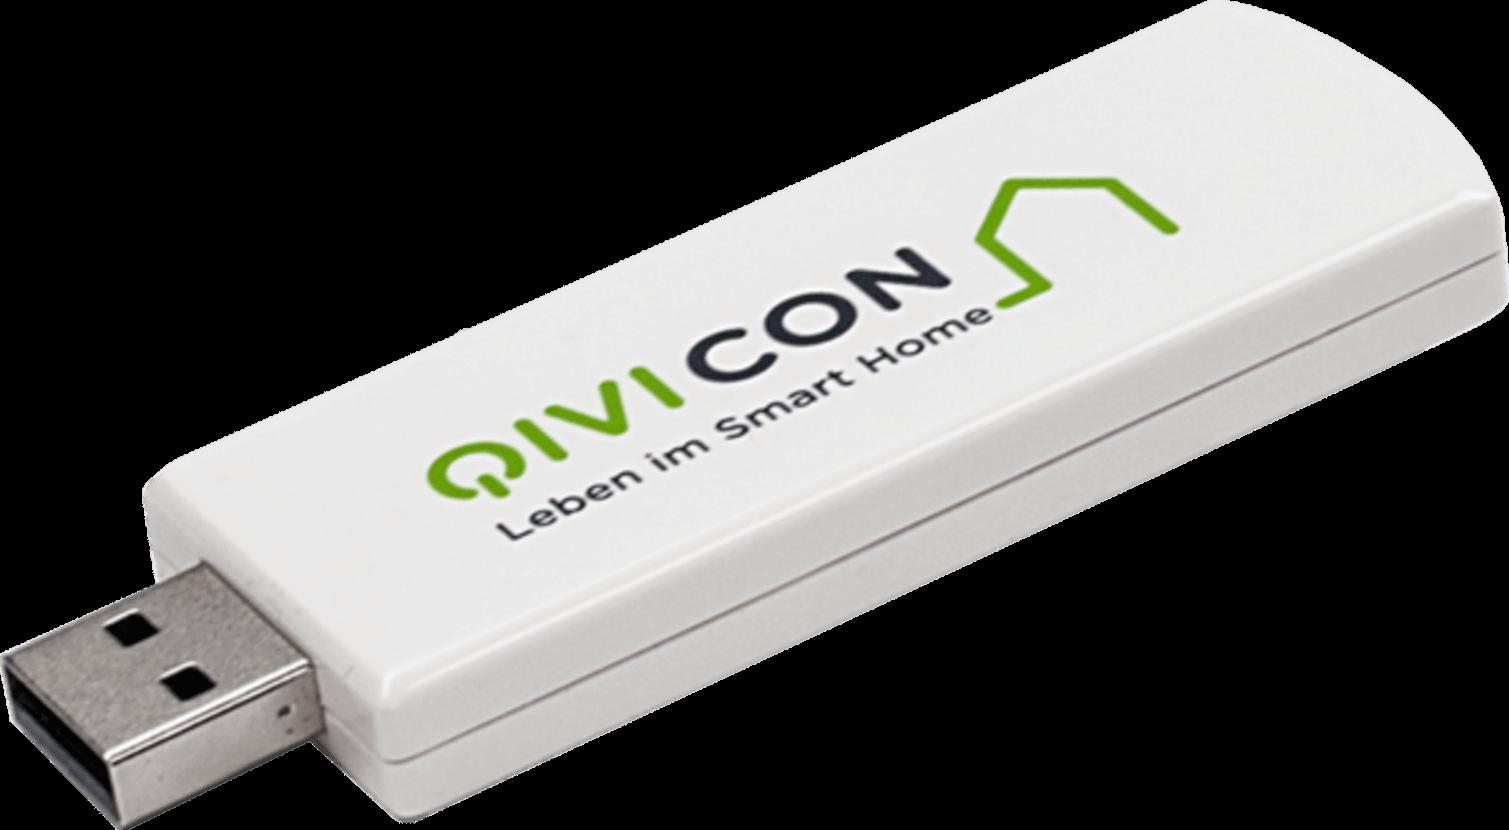 qivicon zigbee-funkstick - smarthome erweiterung